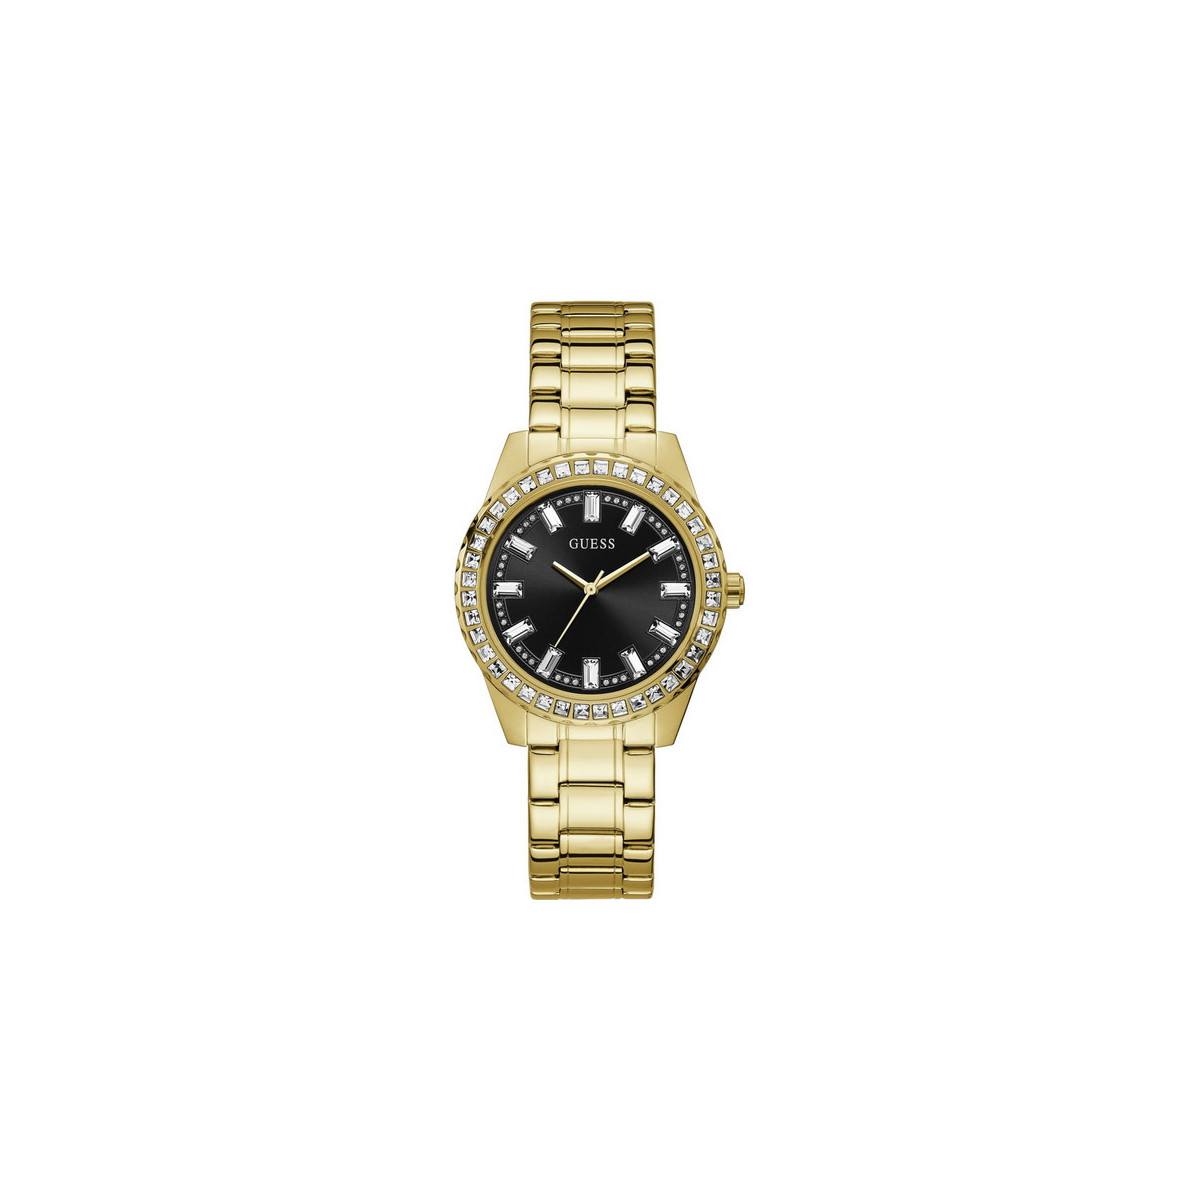 Reloj Guess Sparkler Dorado Mujer GW0111L2